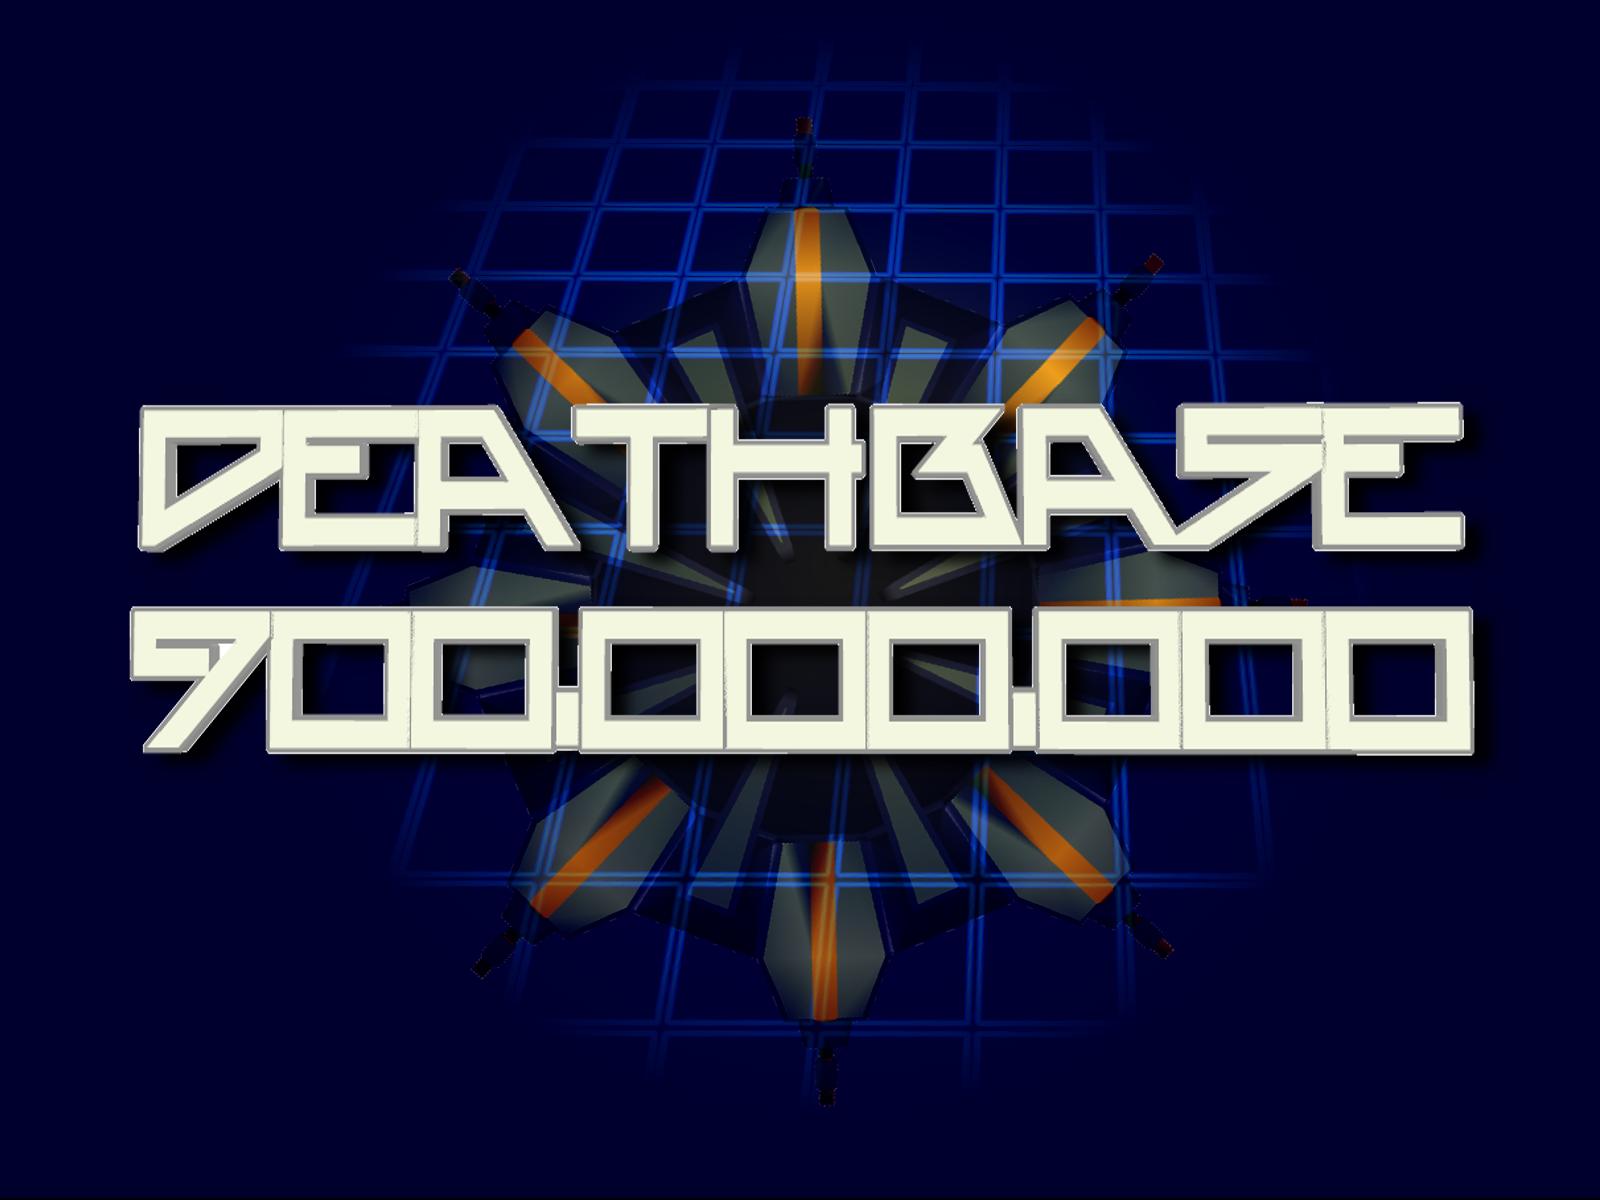 DEATHBASE 900,000,000